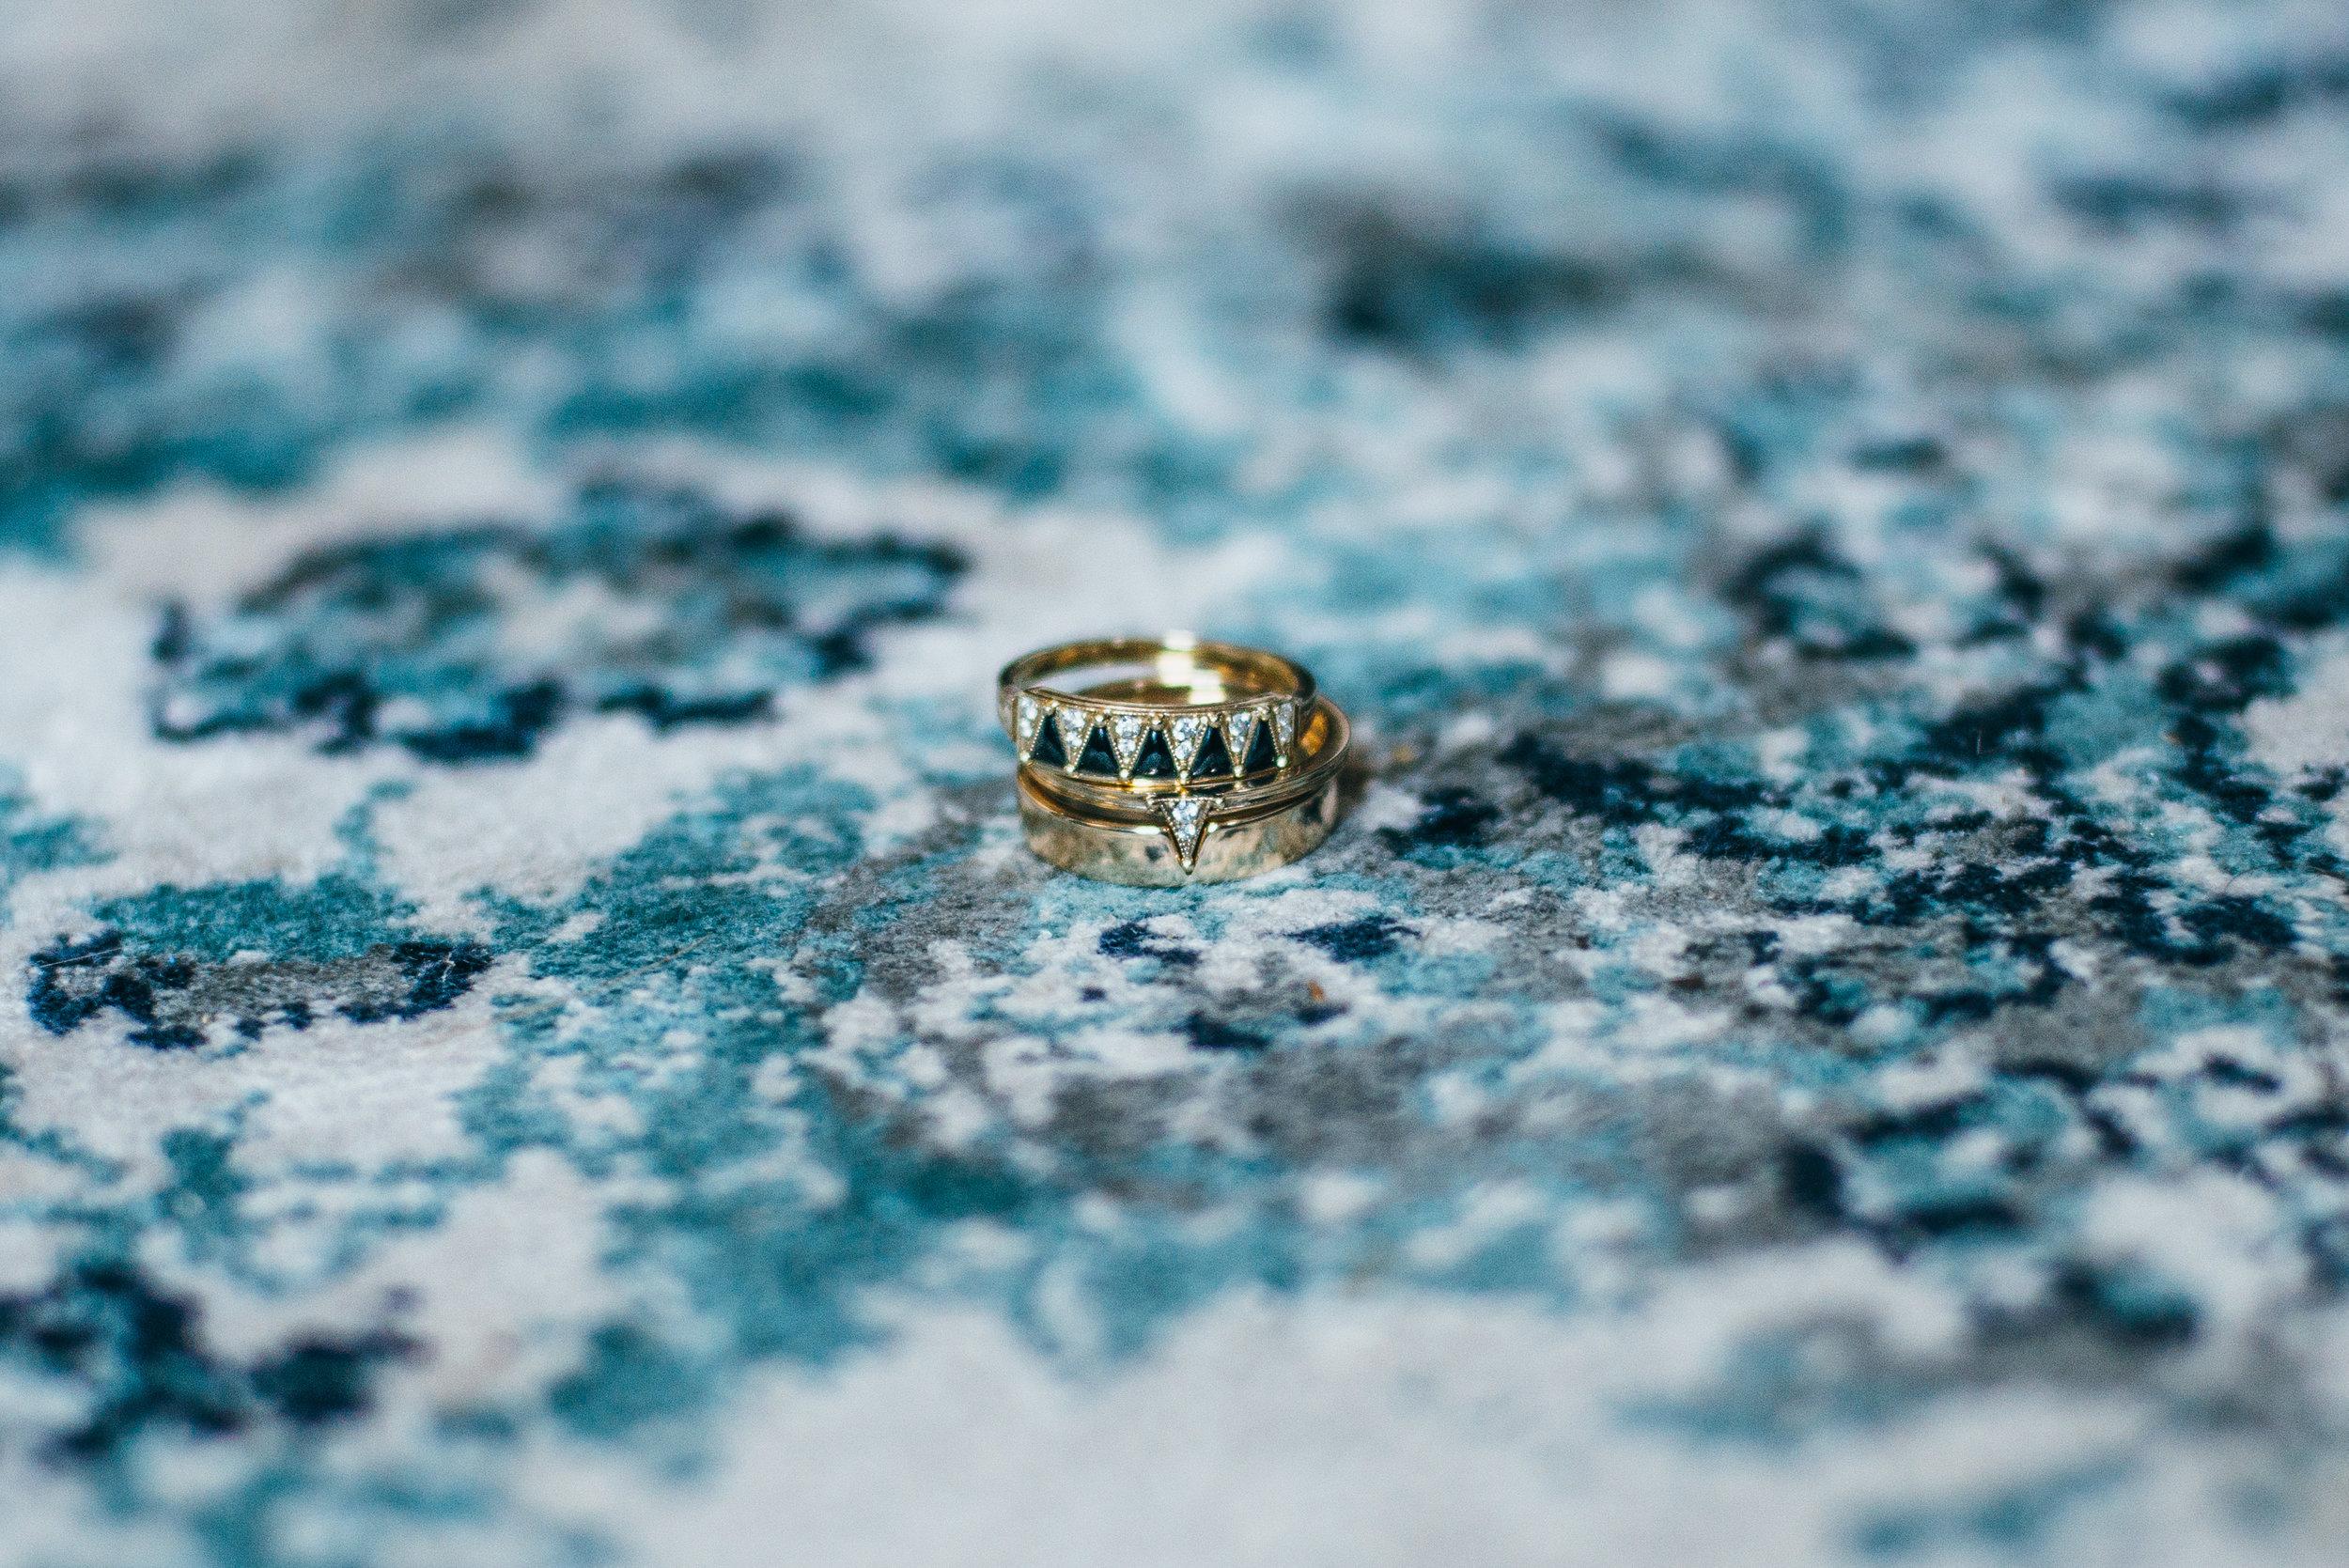 julia-hembree-photography-eden-village-church-wedding-savannah-warehouse-wedding-ivory-and-beau-bridal-boutique-savannah-florist-savannah-wedding-planner-savannah-event-design-scad-wedding-artist-wedding-savannah-funky-wedding-handmade-wedding-5.jpg